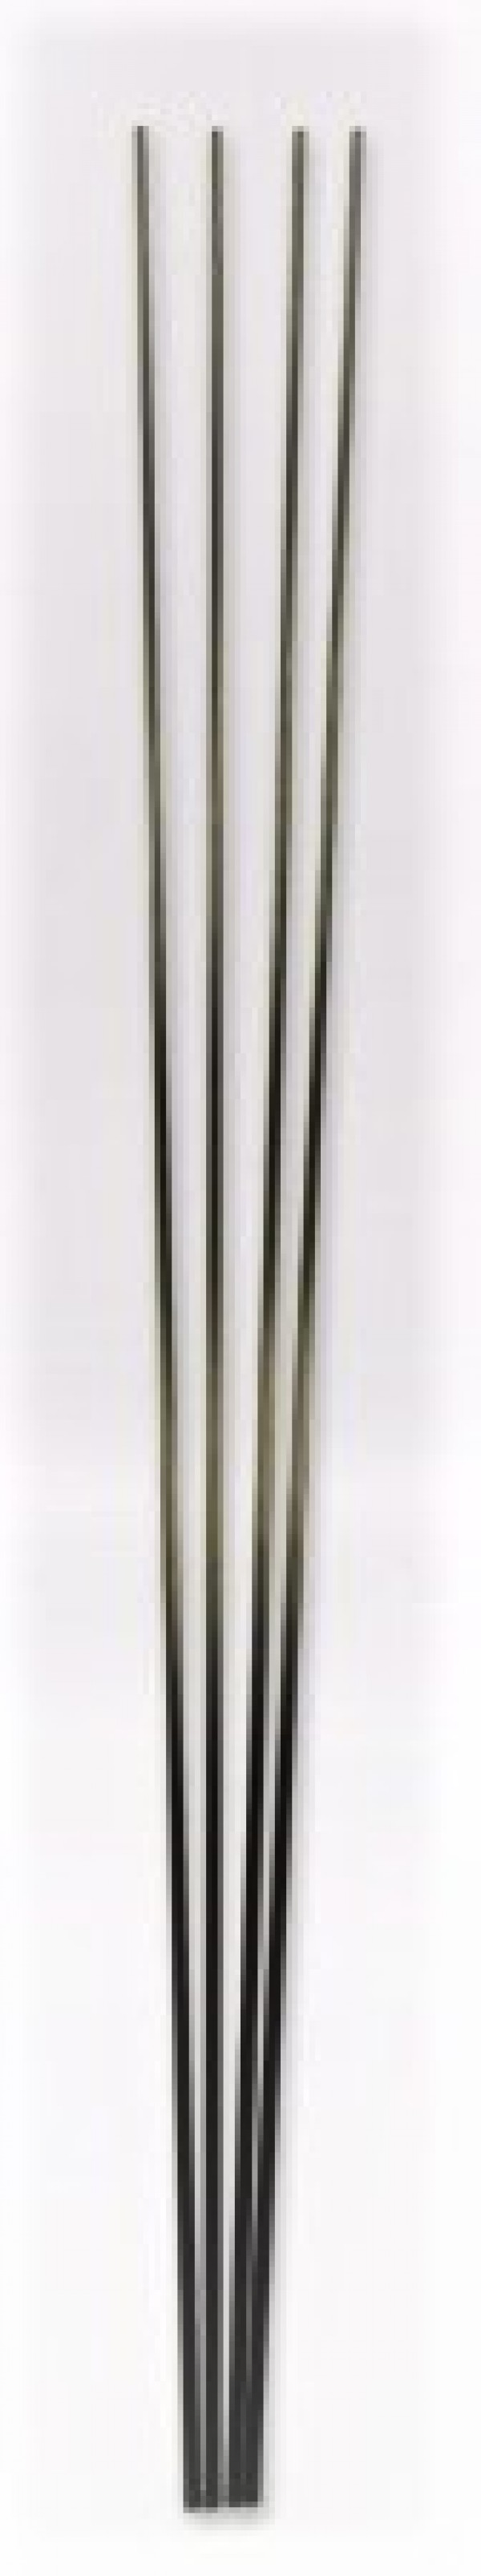 Rezervni deo-Karbon sekcija III deo 9mm x 1.1m